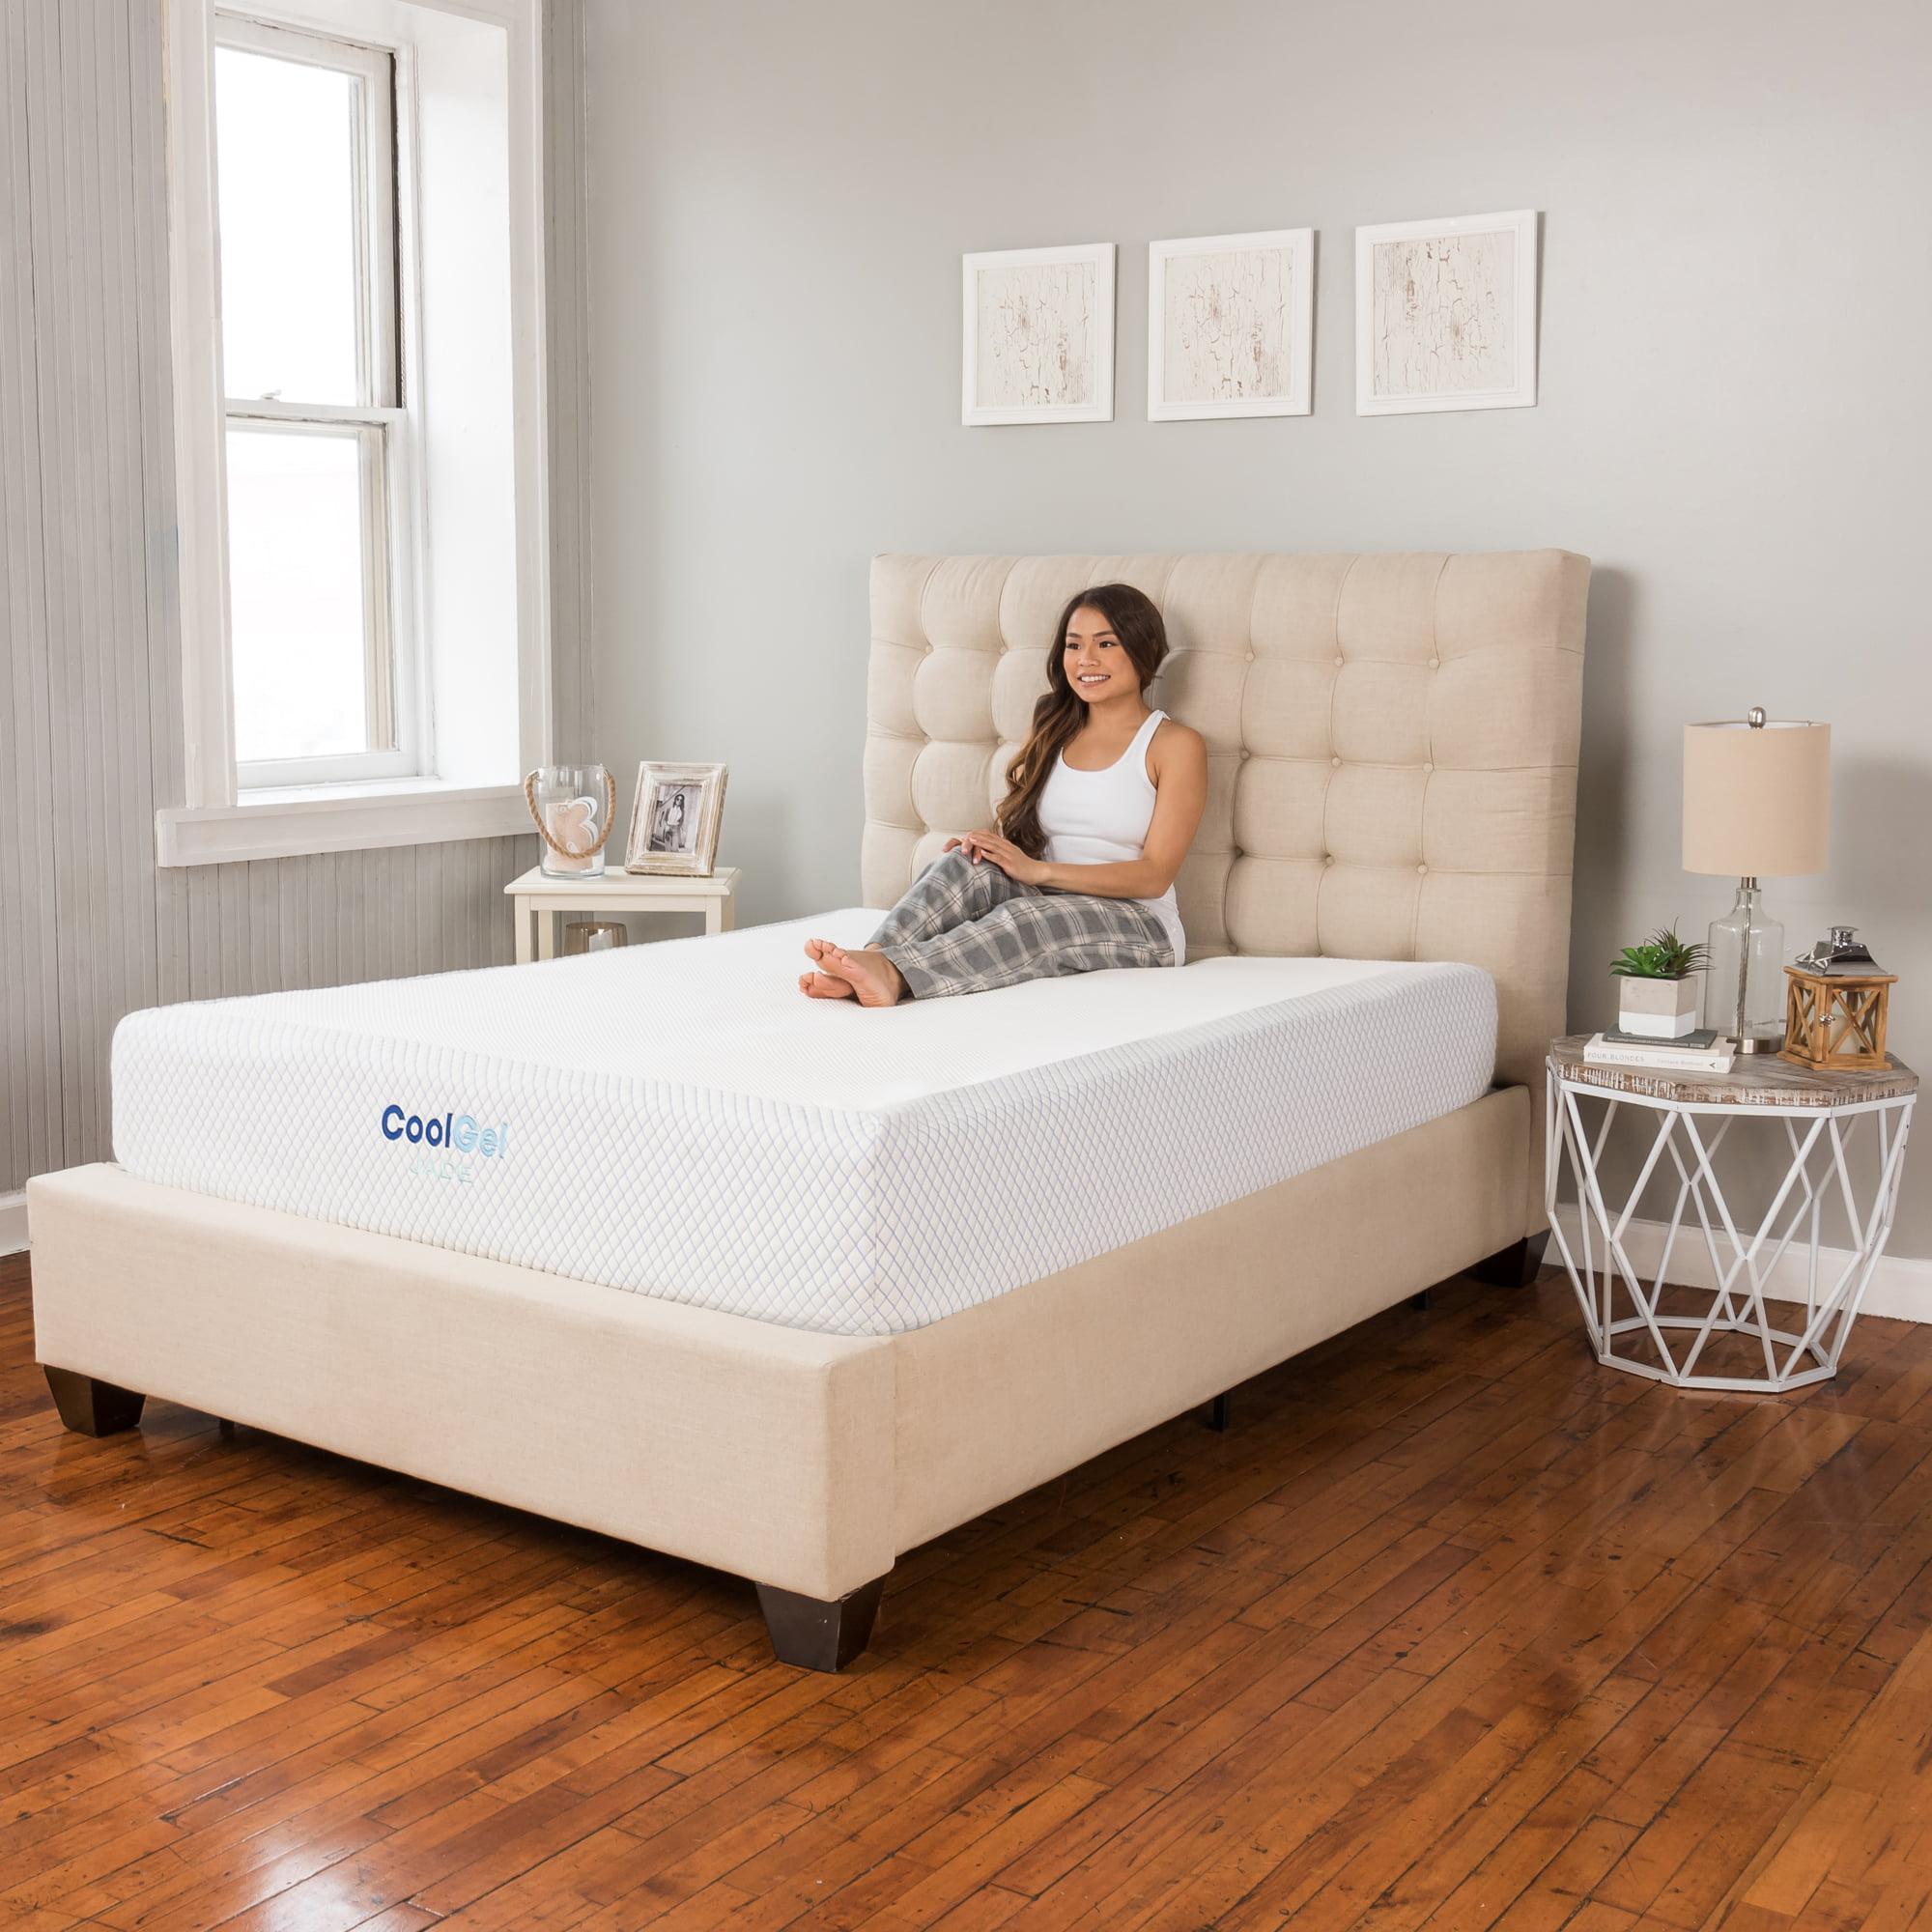 Modern Sleep Cool Gel Jade Latex and Memory Foam Mattress - Walmart.com